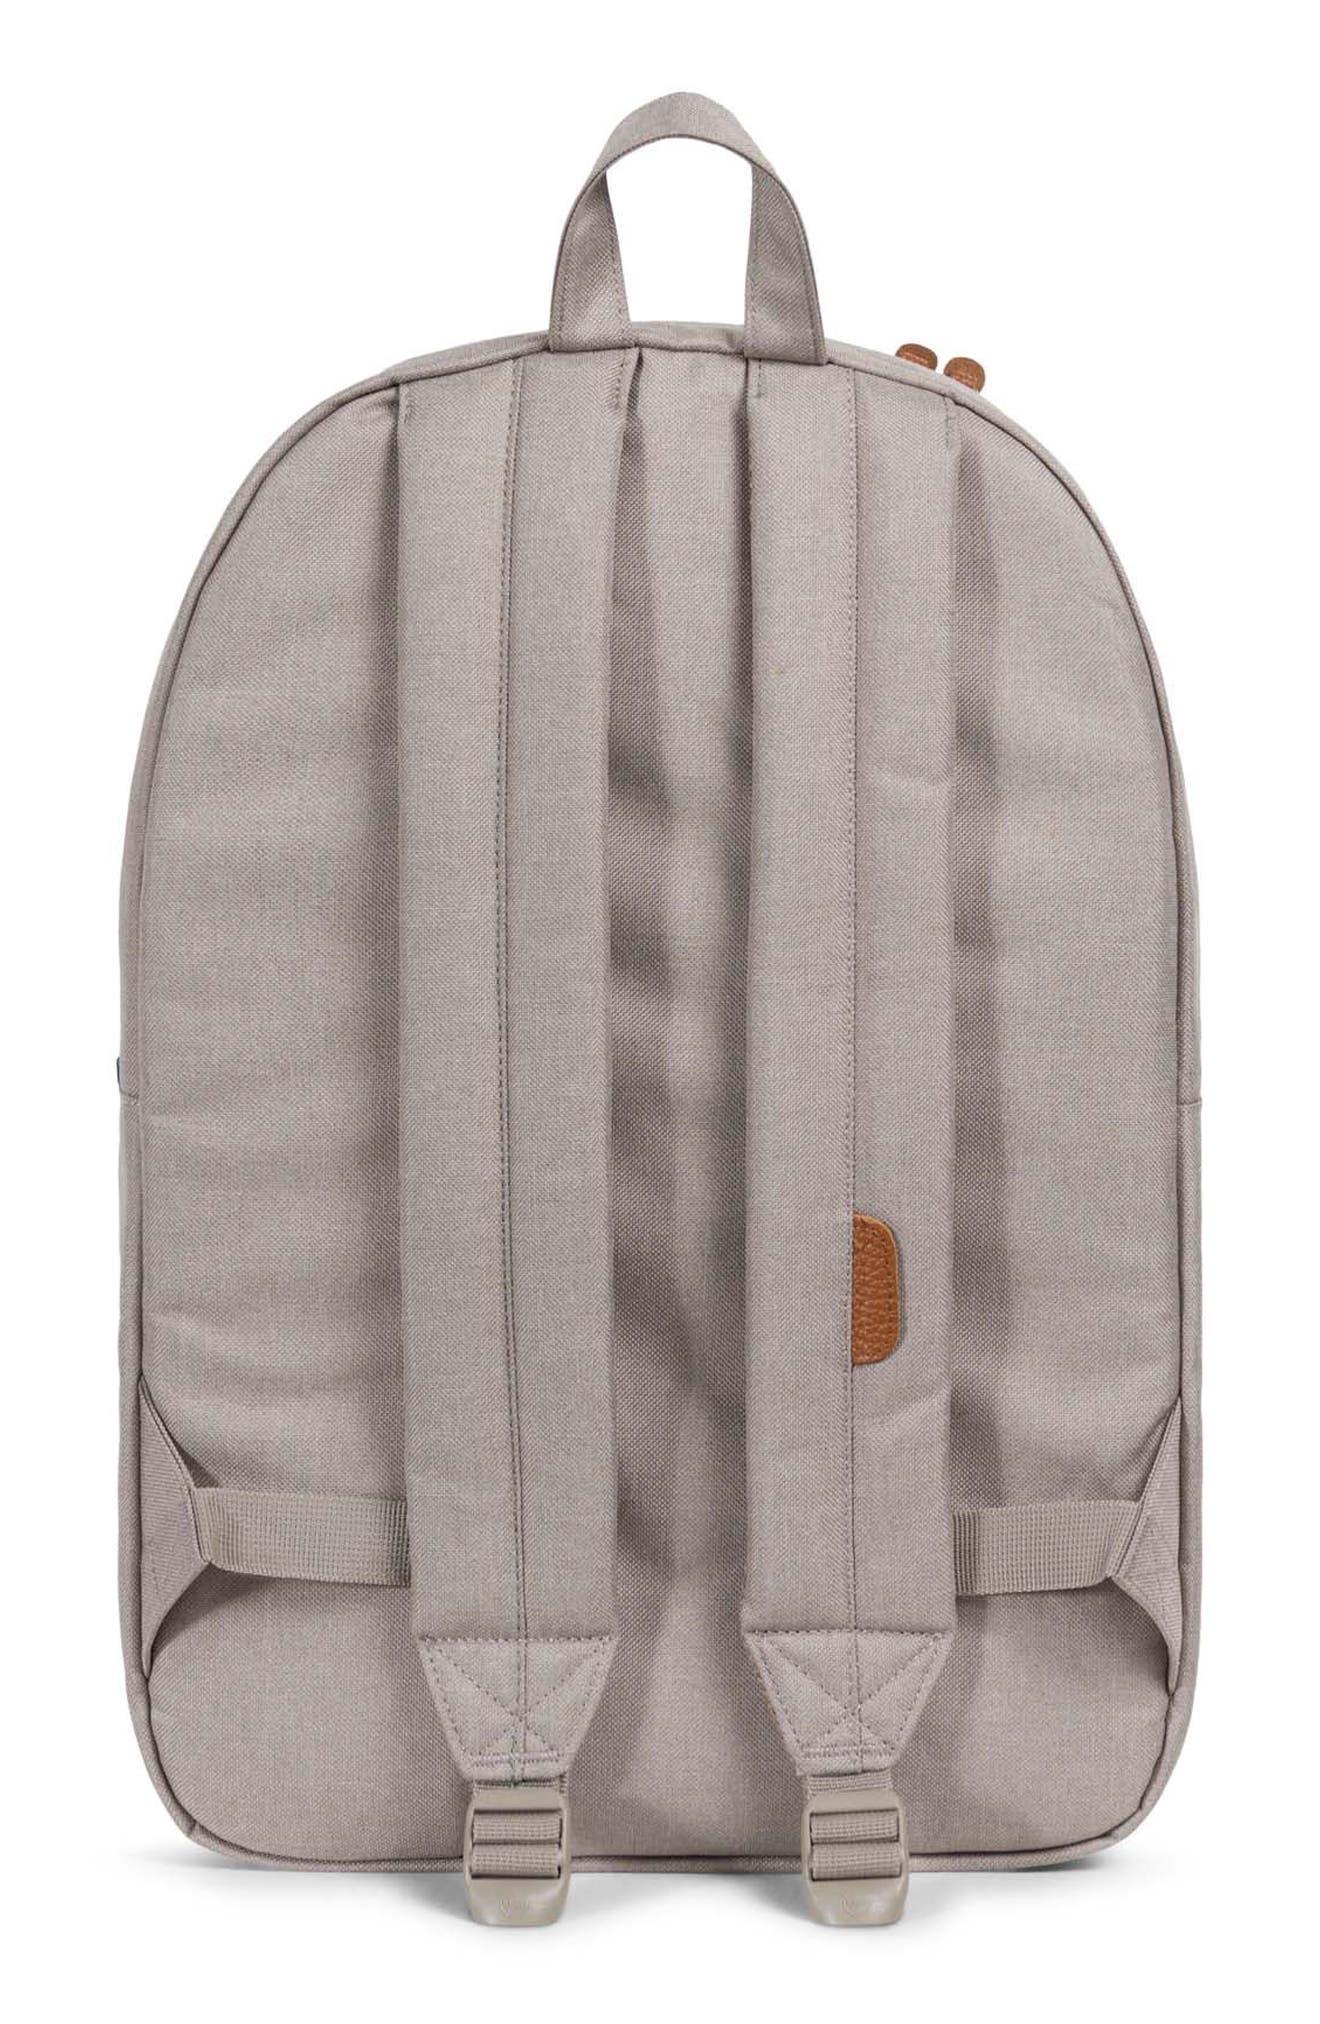 Heritage Backpack,                             Alternate thumbnail 2, color,                             Khaki/ Shadow/ Brick Red/ Tan